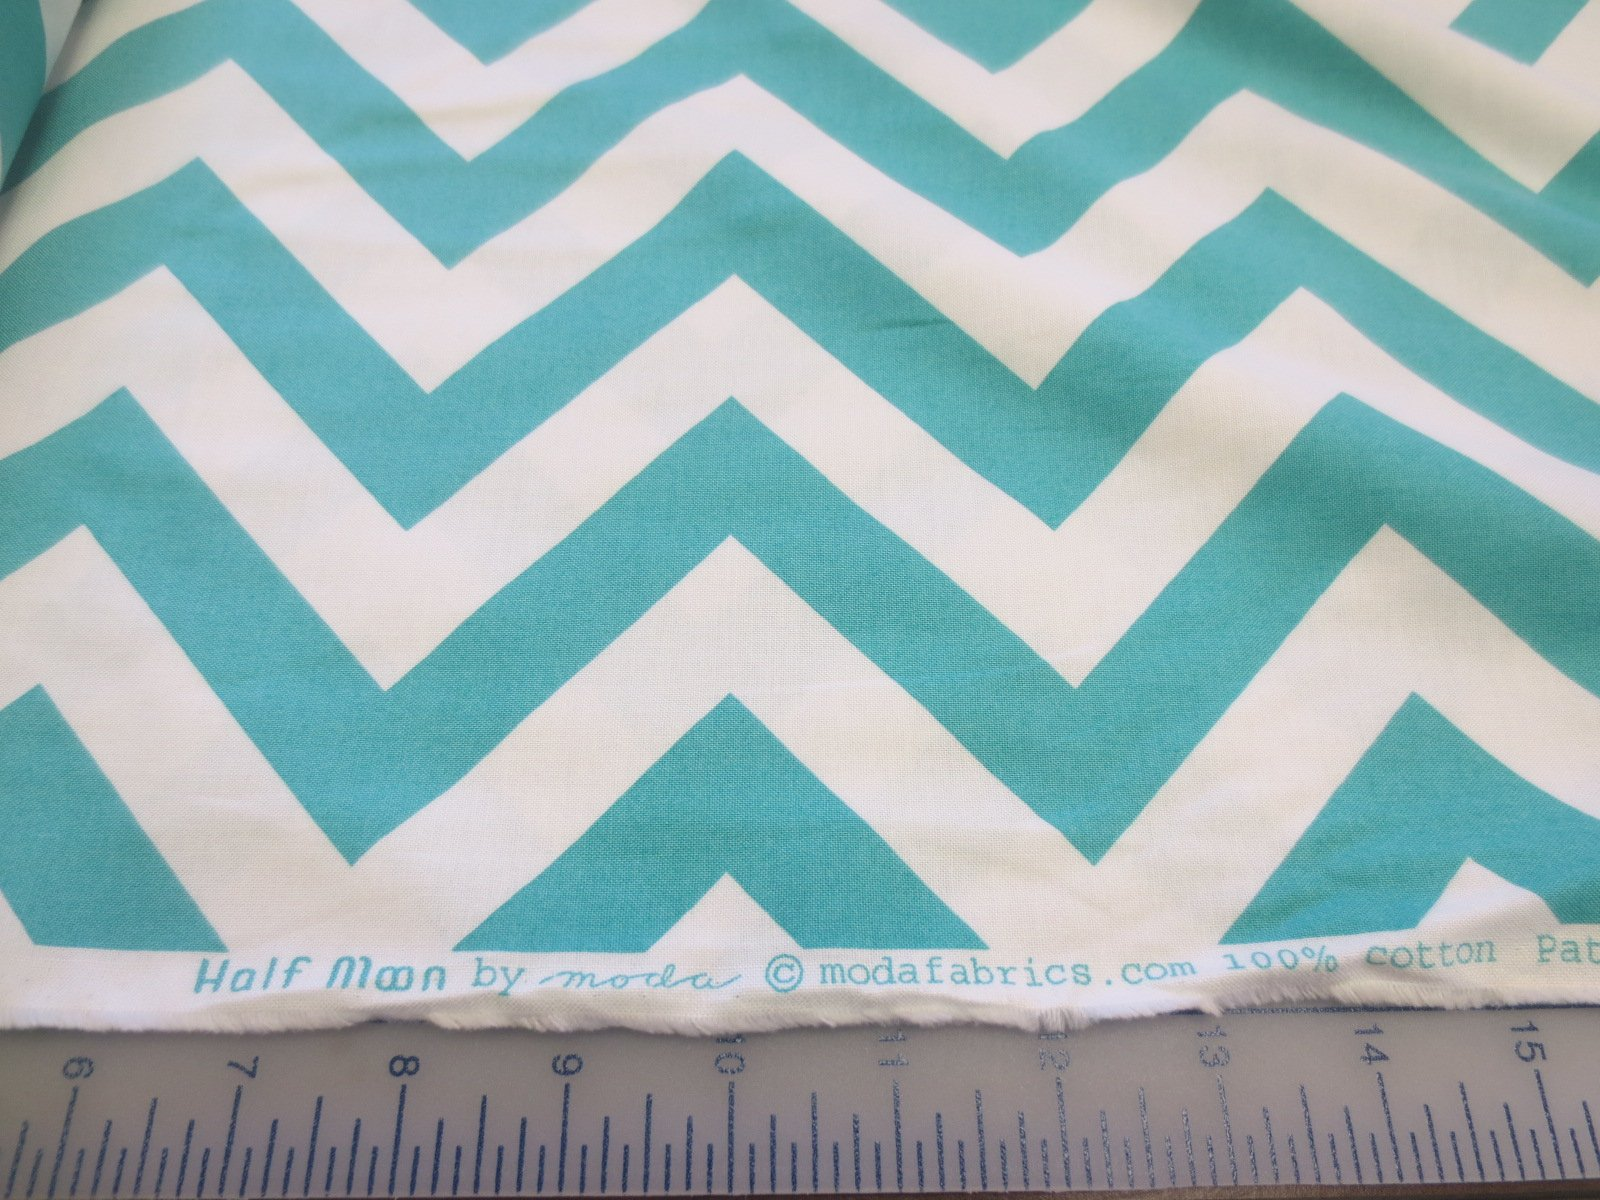 Moda fabrics half moon pattern 32349 teal for Moon pattern fabric